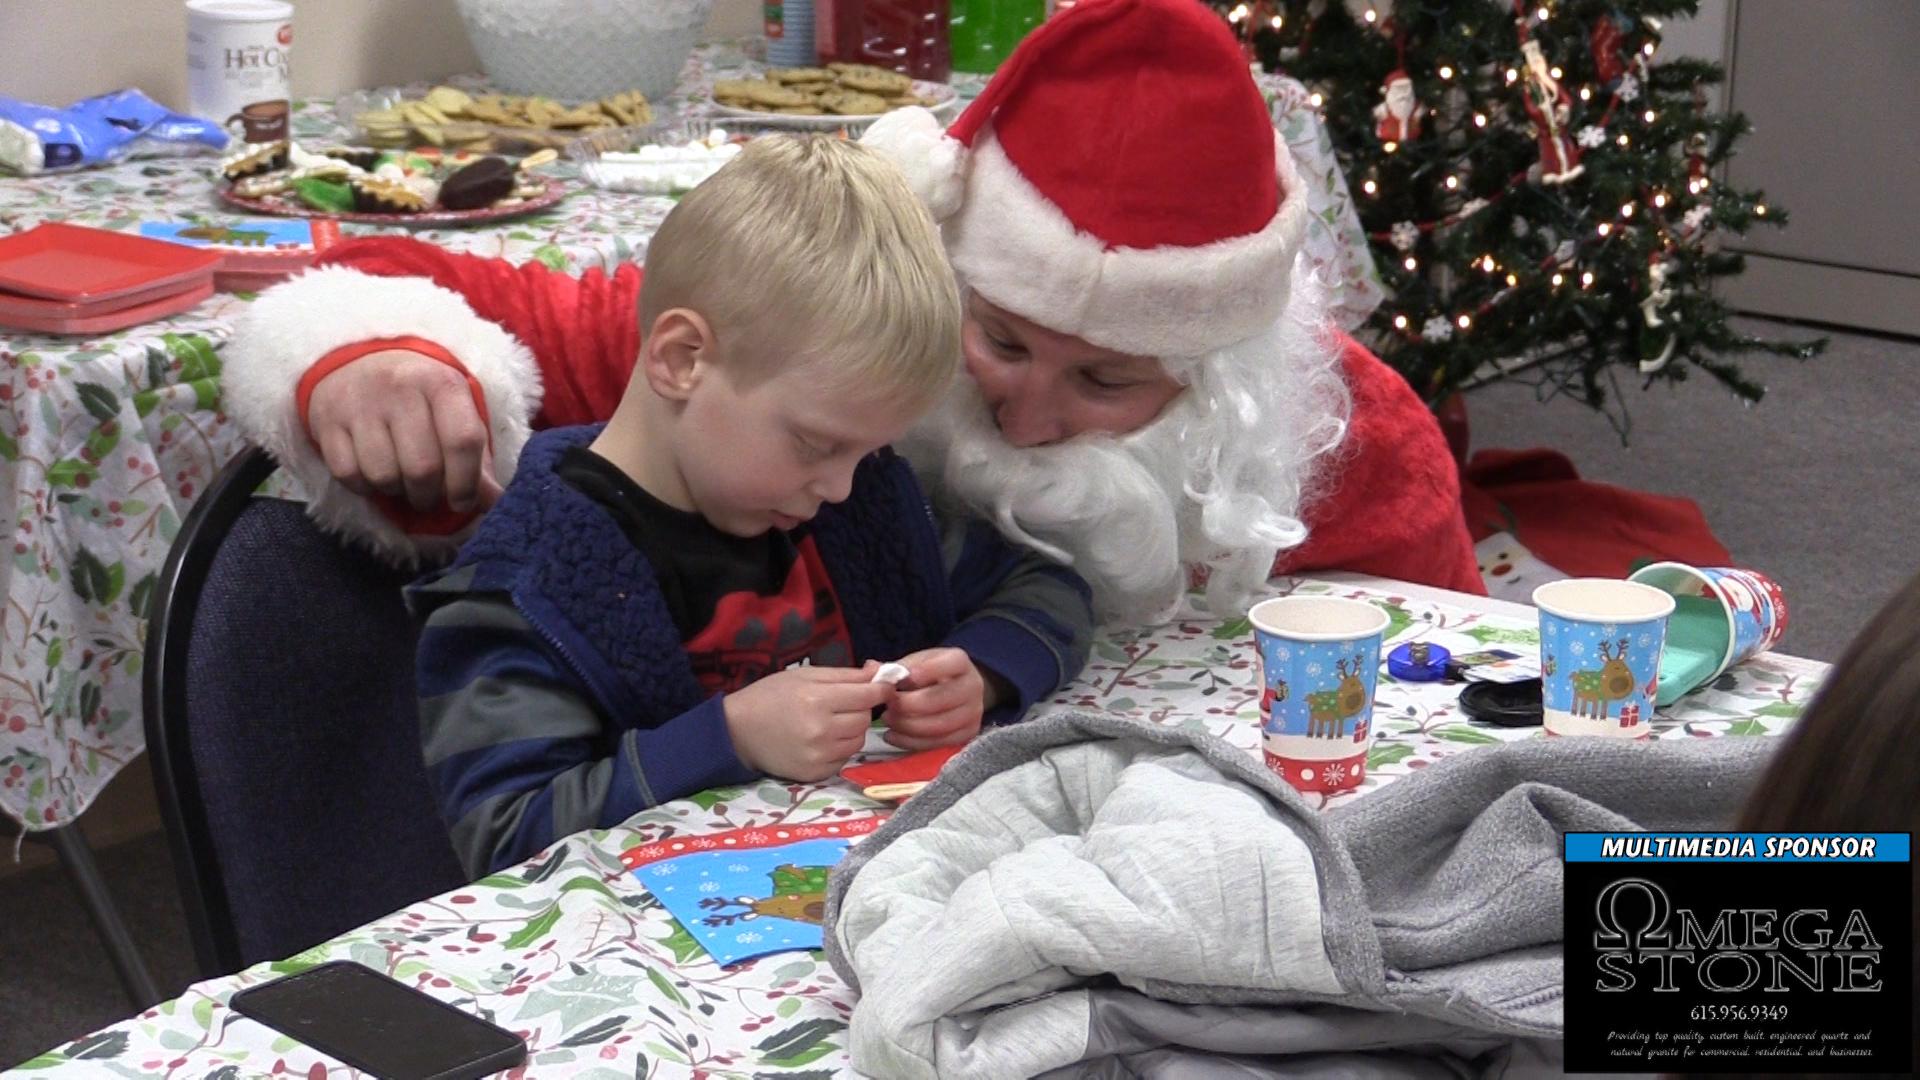 VIDEO - Sensitive Santa